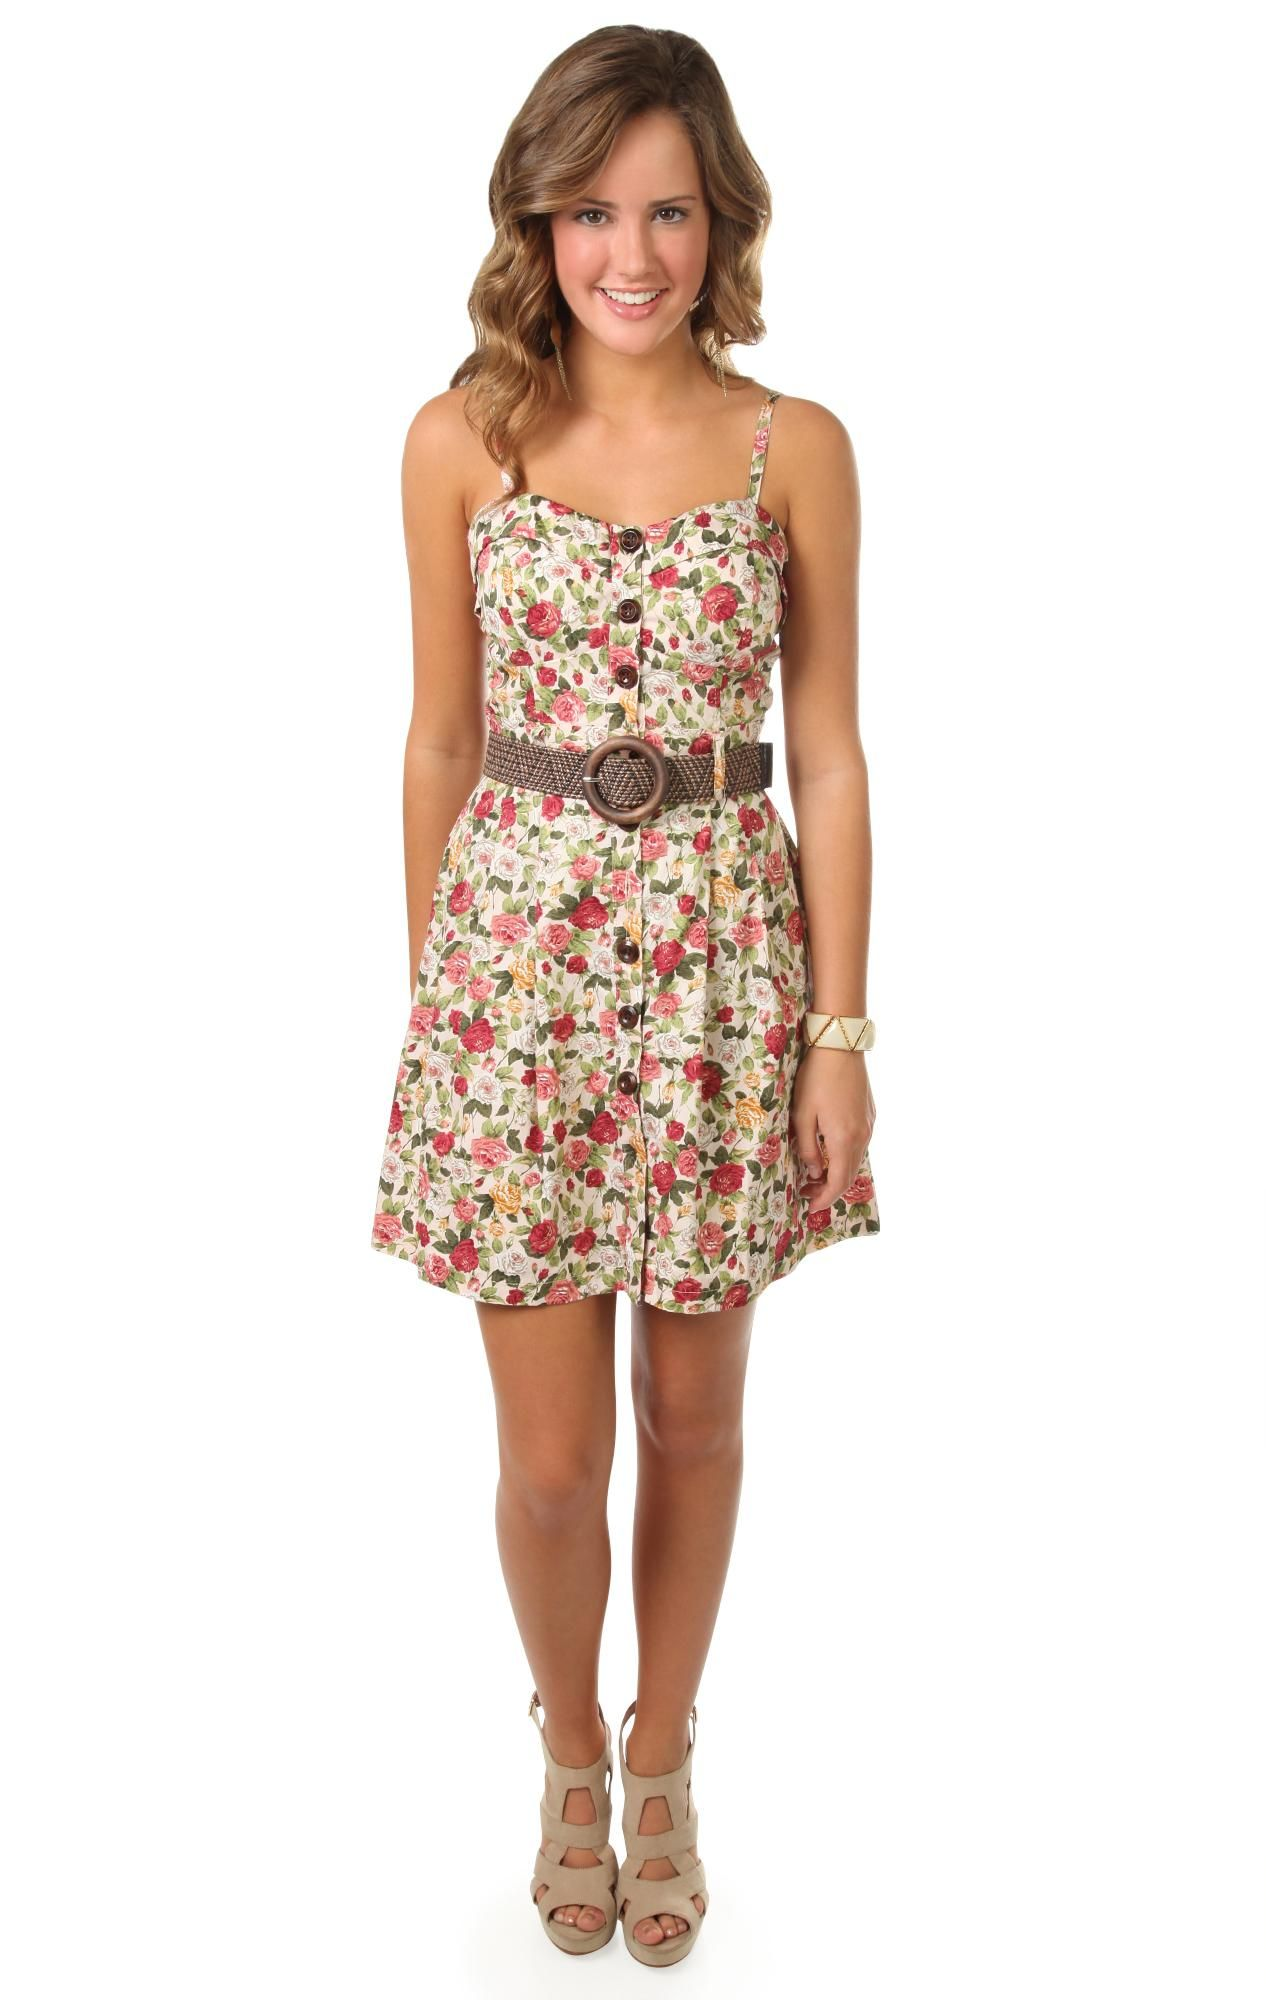 7fc0a7389f51 floral printed spaghetti strap corset style casual dress Spaghetti, Flower  Power, Spring Summer Fashion